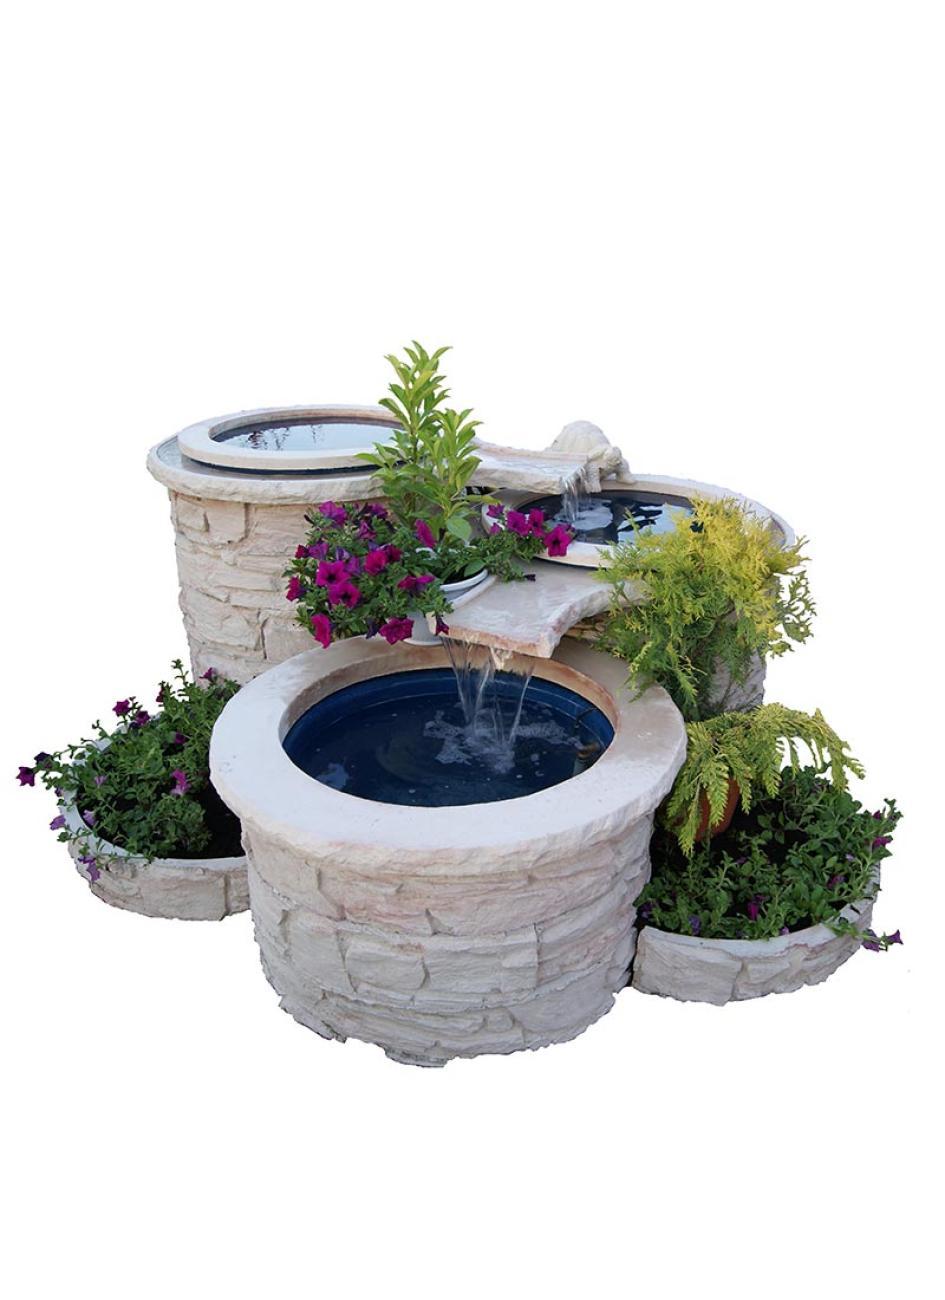 Bassin Fontaine De Jardin fontaine de jardin en cascade en pierre reconstituée - 3 bassins